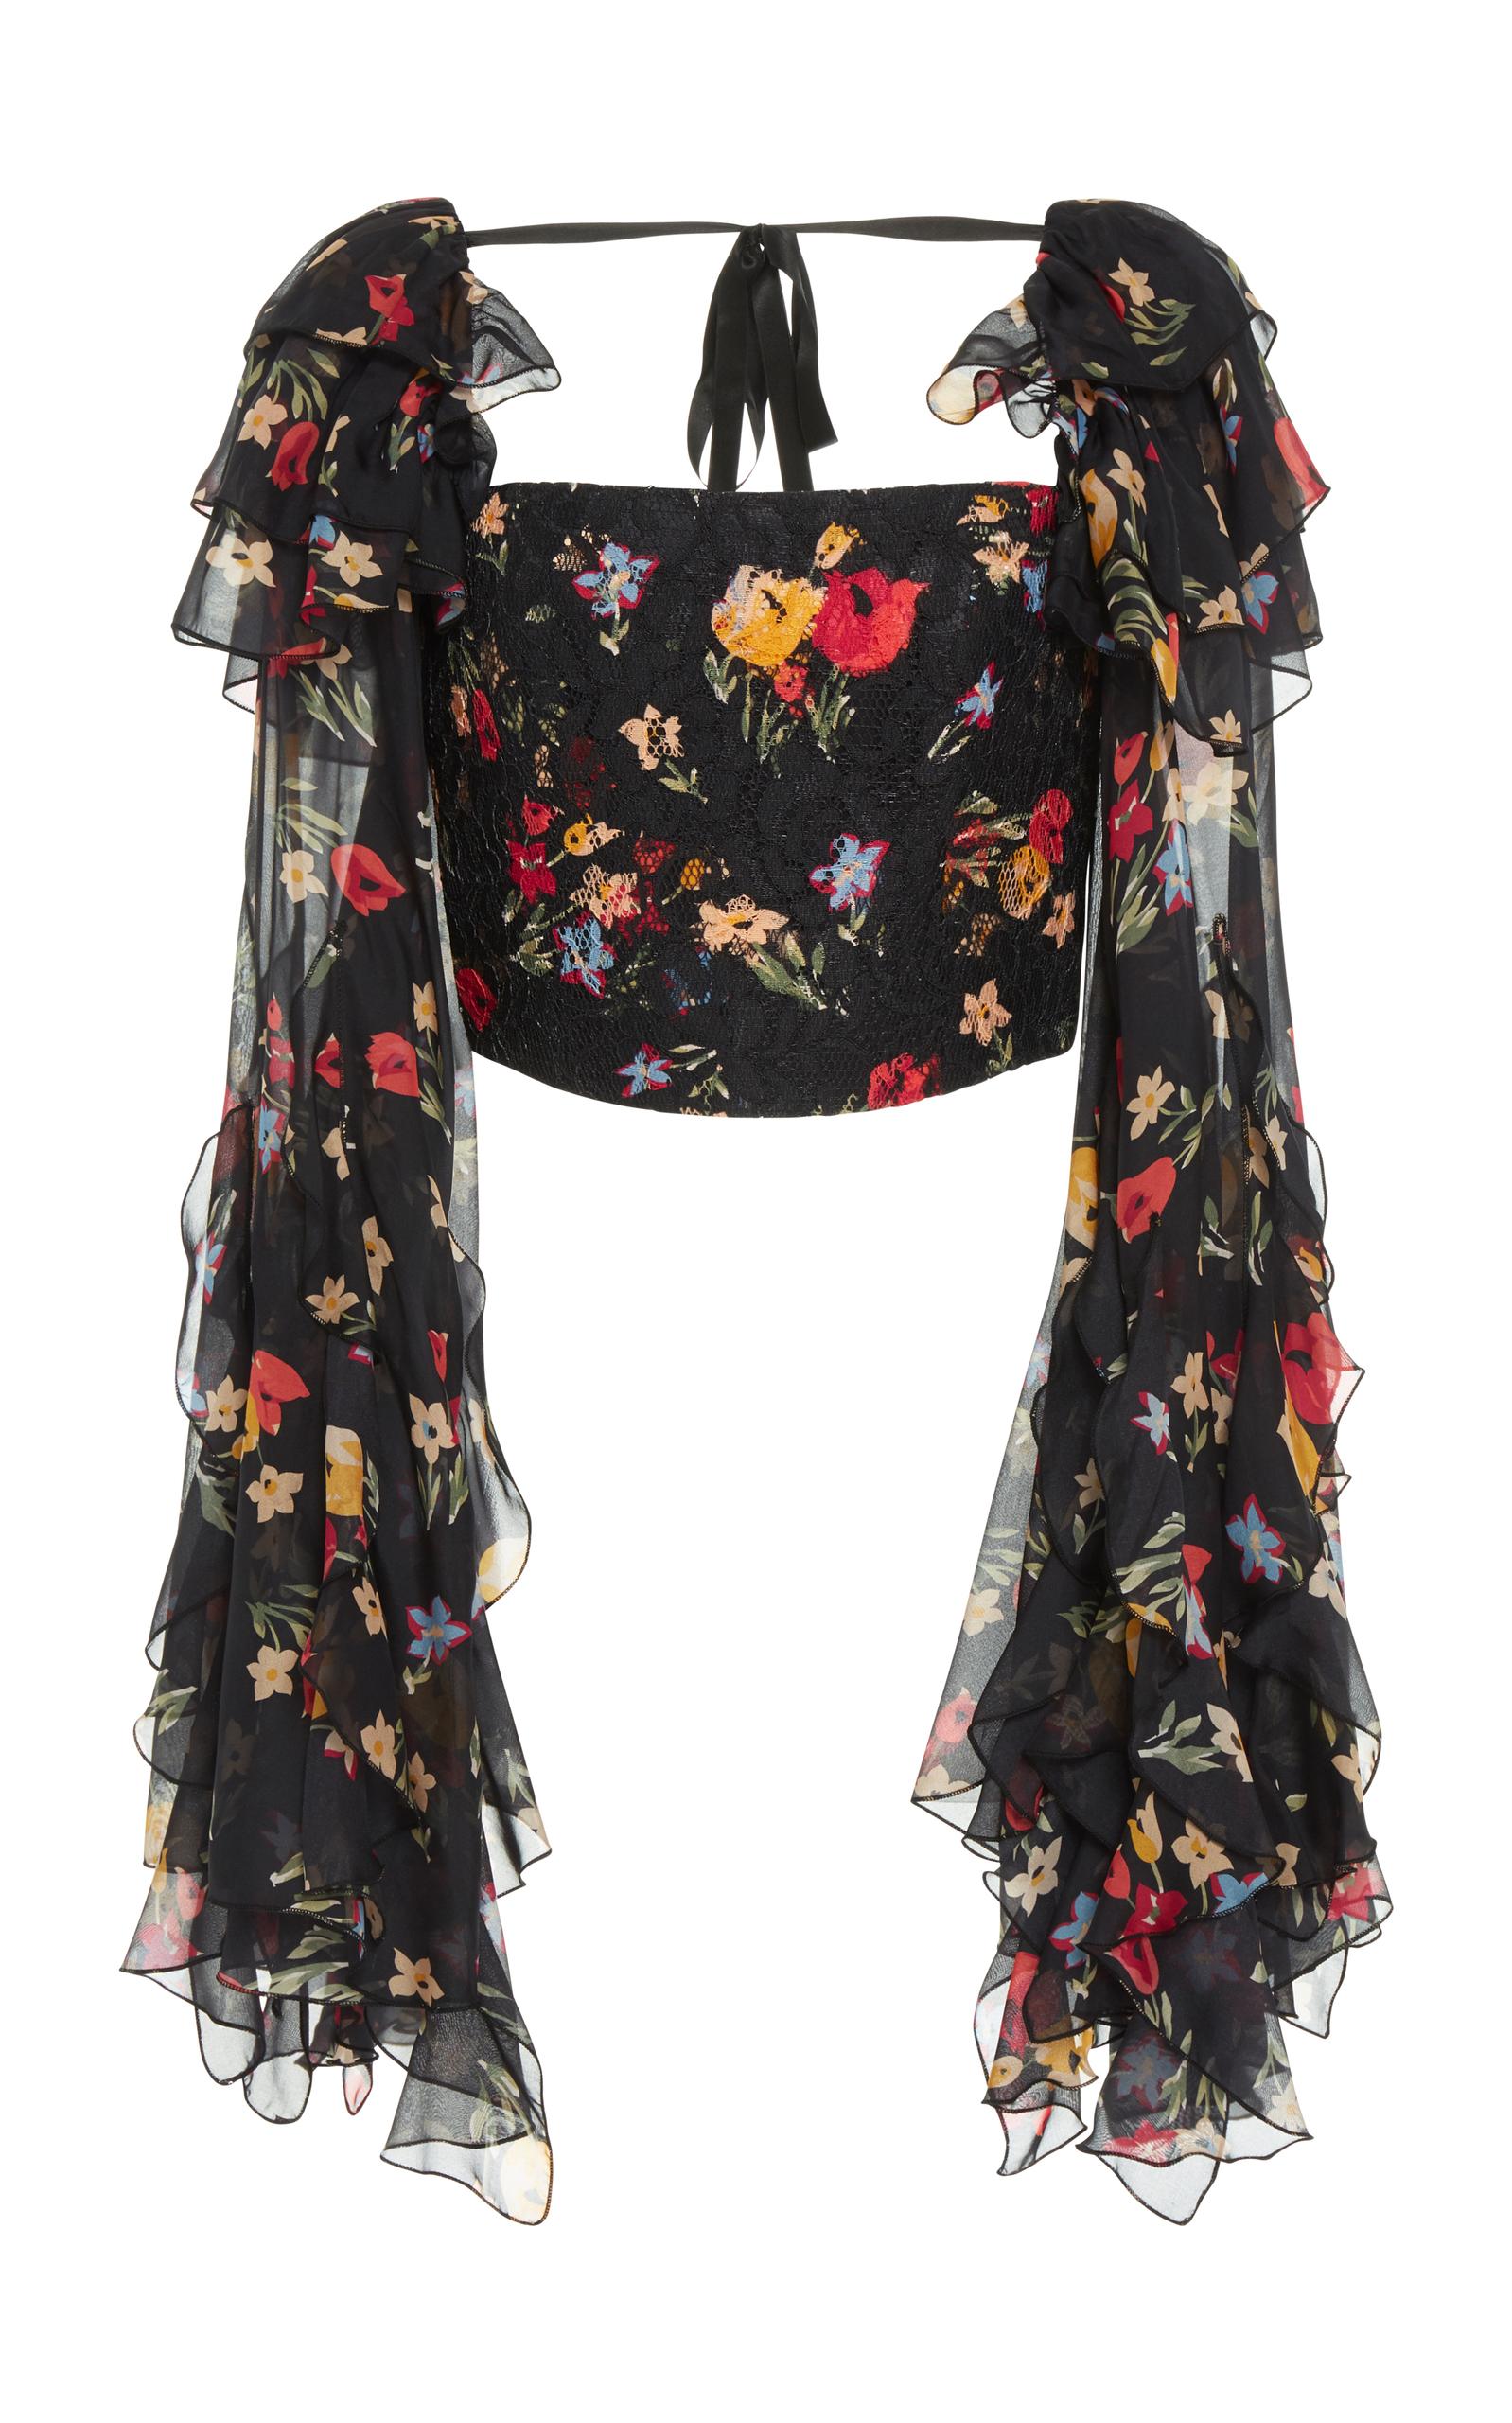 RODARTE Square-Neck Floral-Print Silk-Blend Blouse in Multi